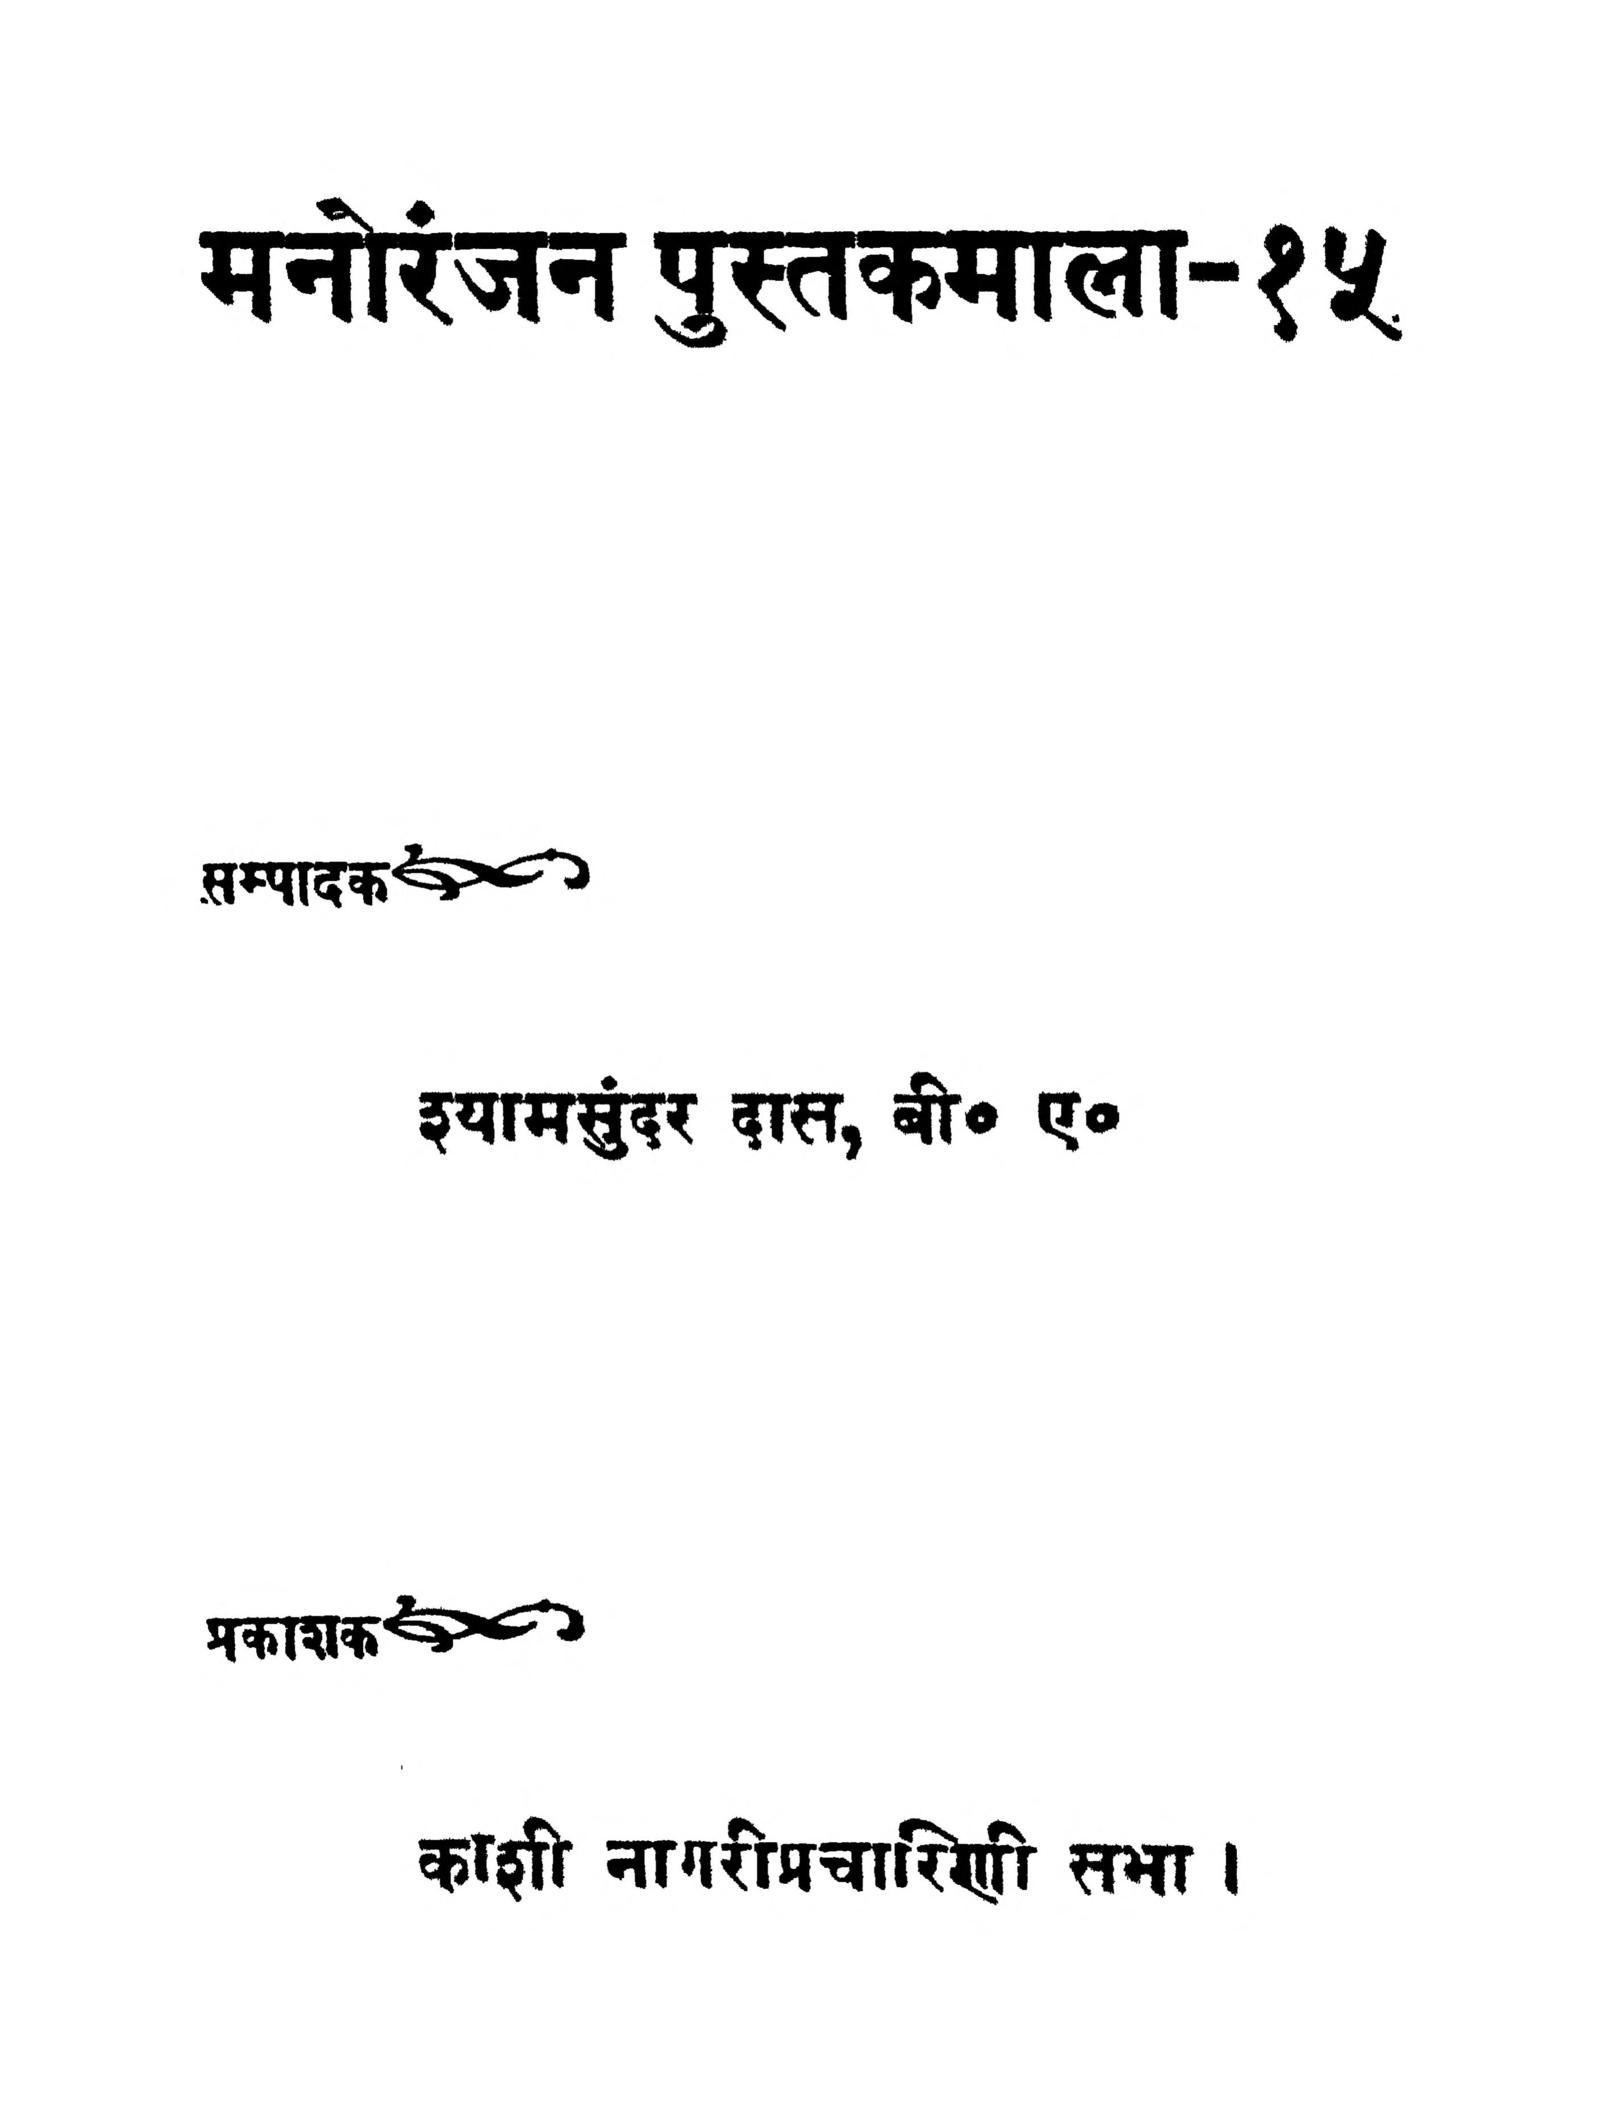 Book Image : मनोरंजन पुस्तकमाला 15  - Manoranjan Pustakmala 15